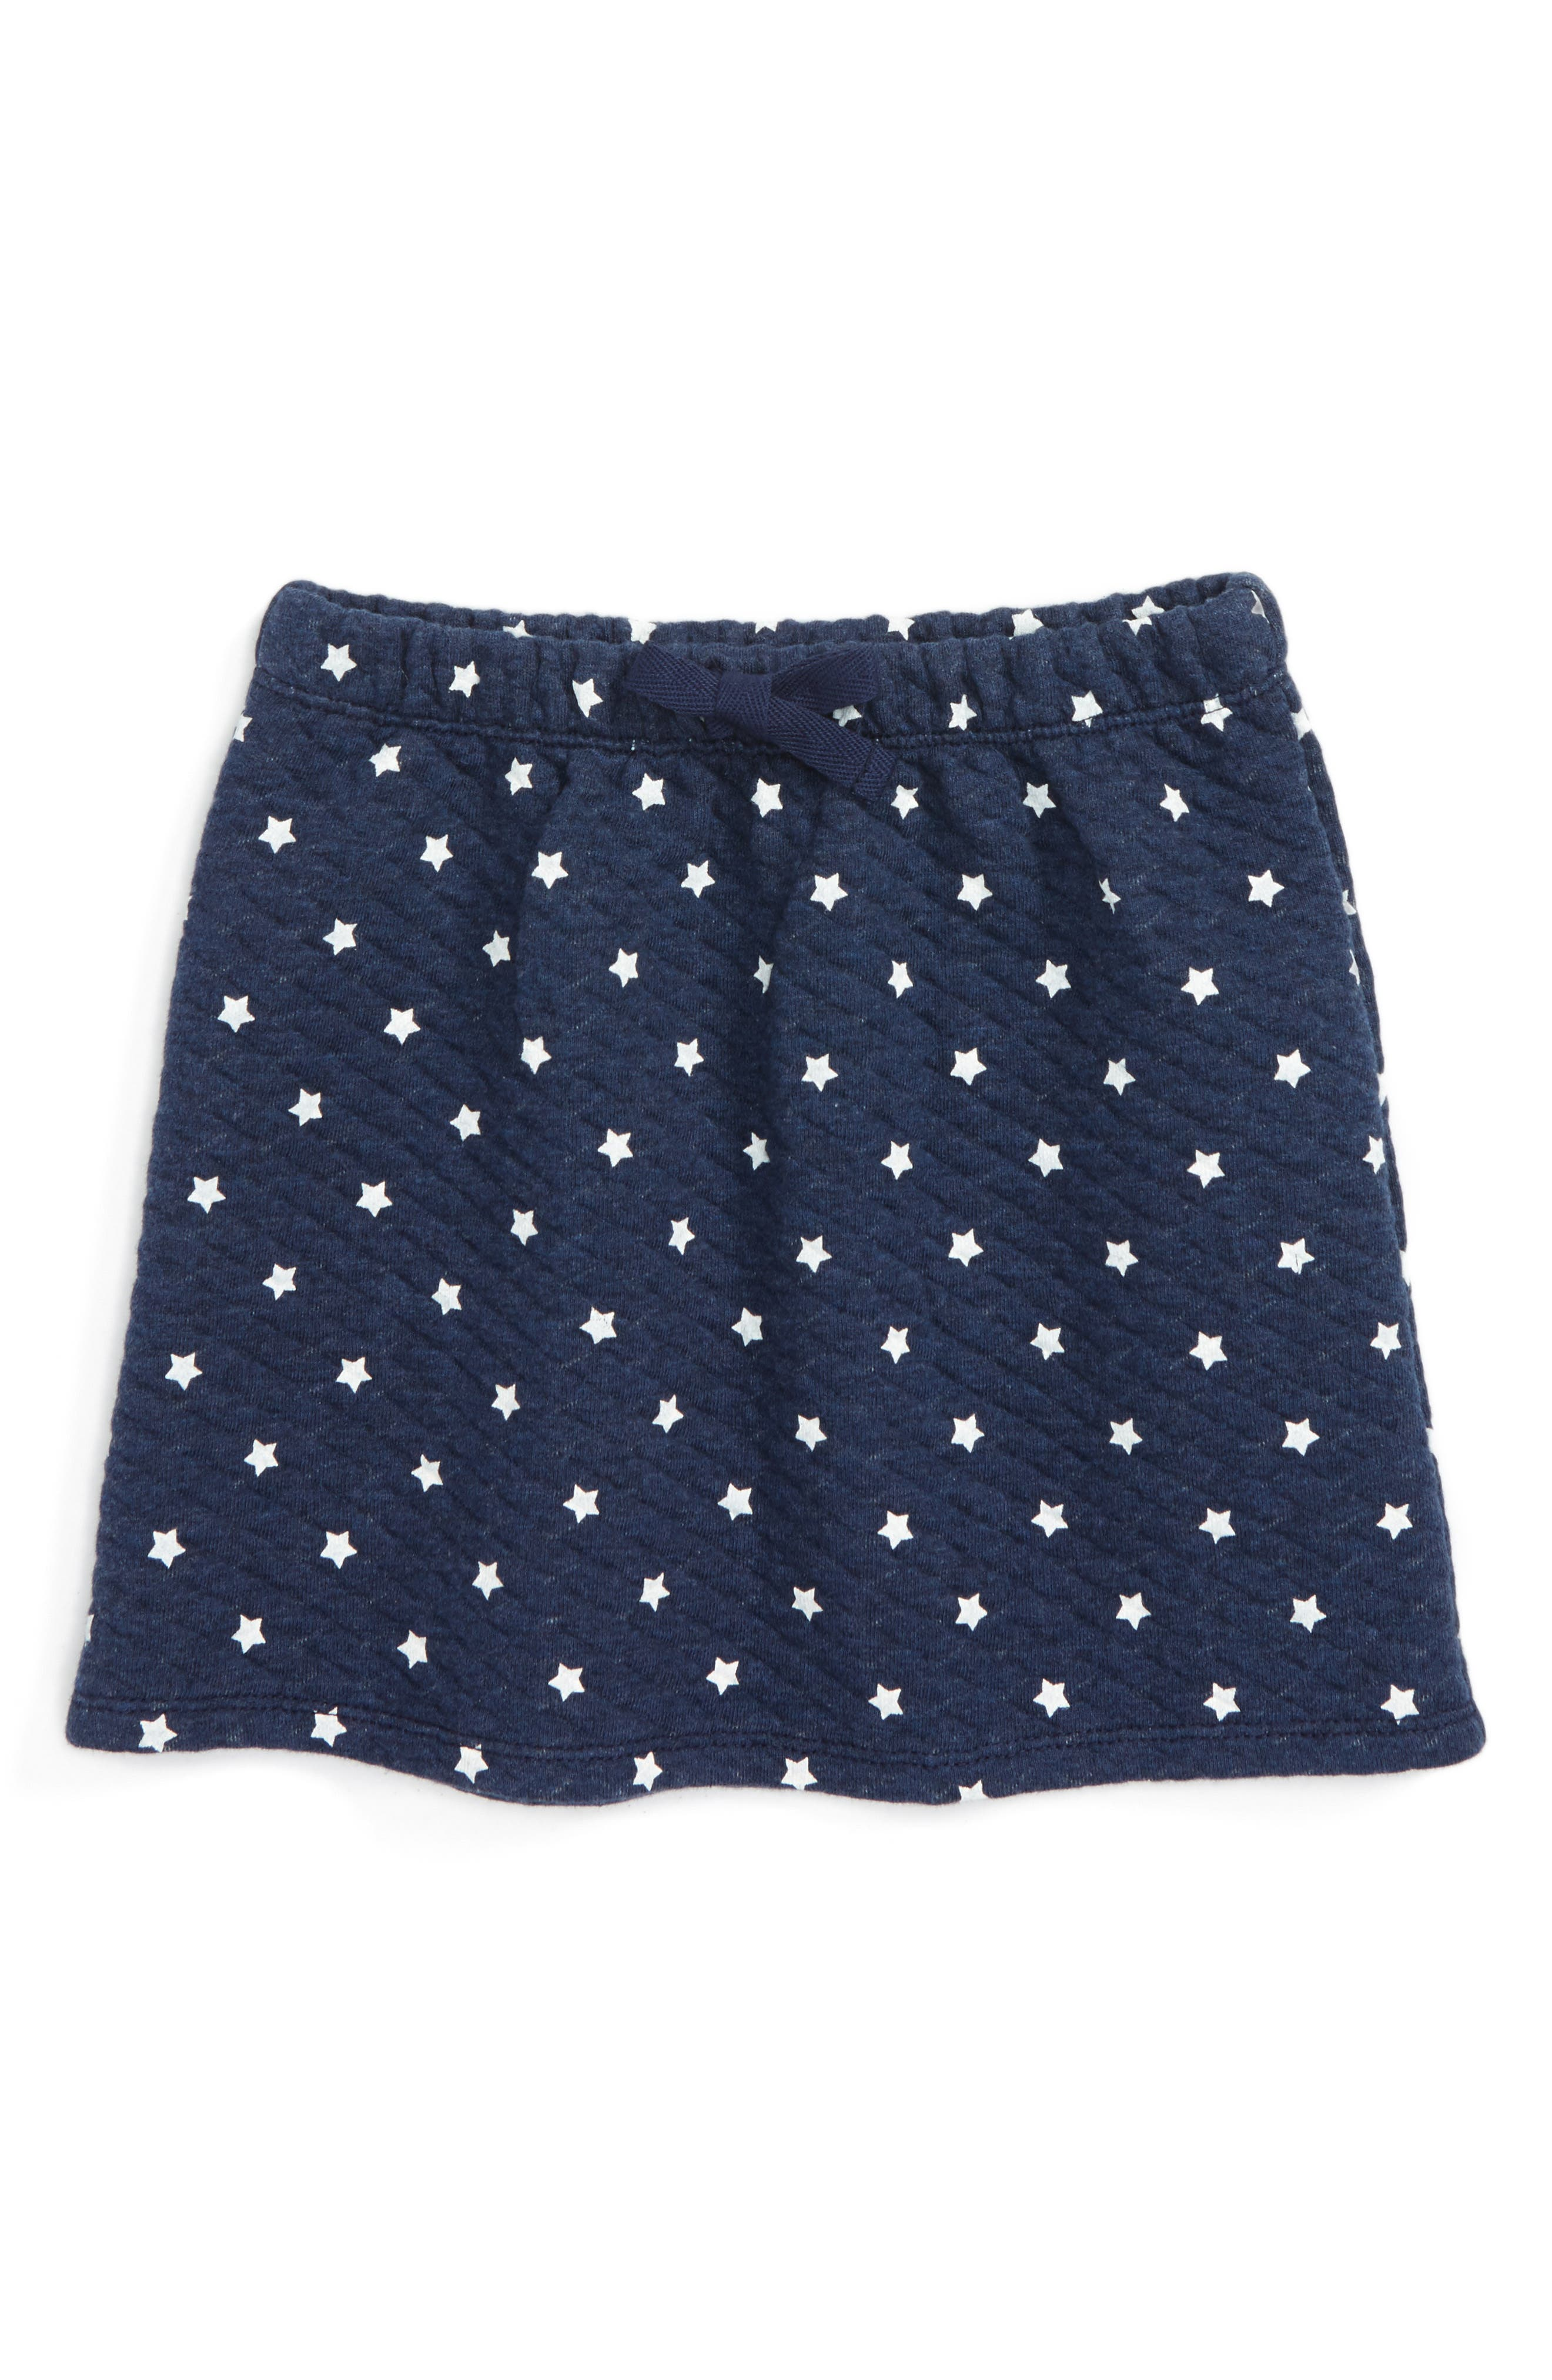 Thea Star Skirt,                         Main,                         color, Navy Peacoat Heather Stars